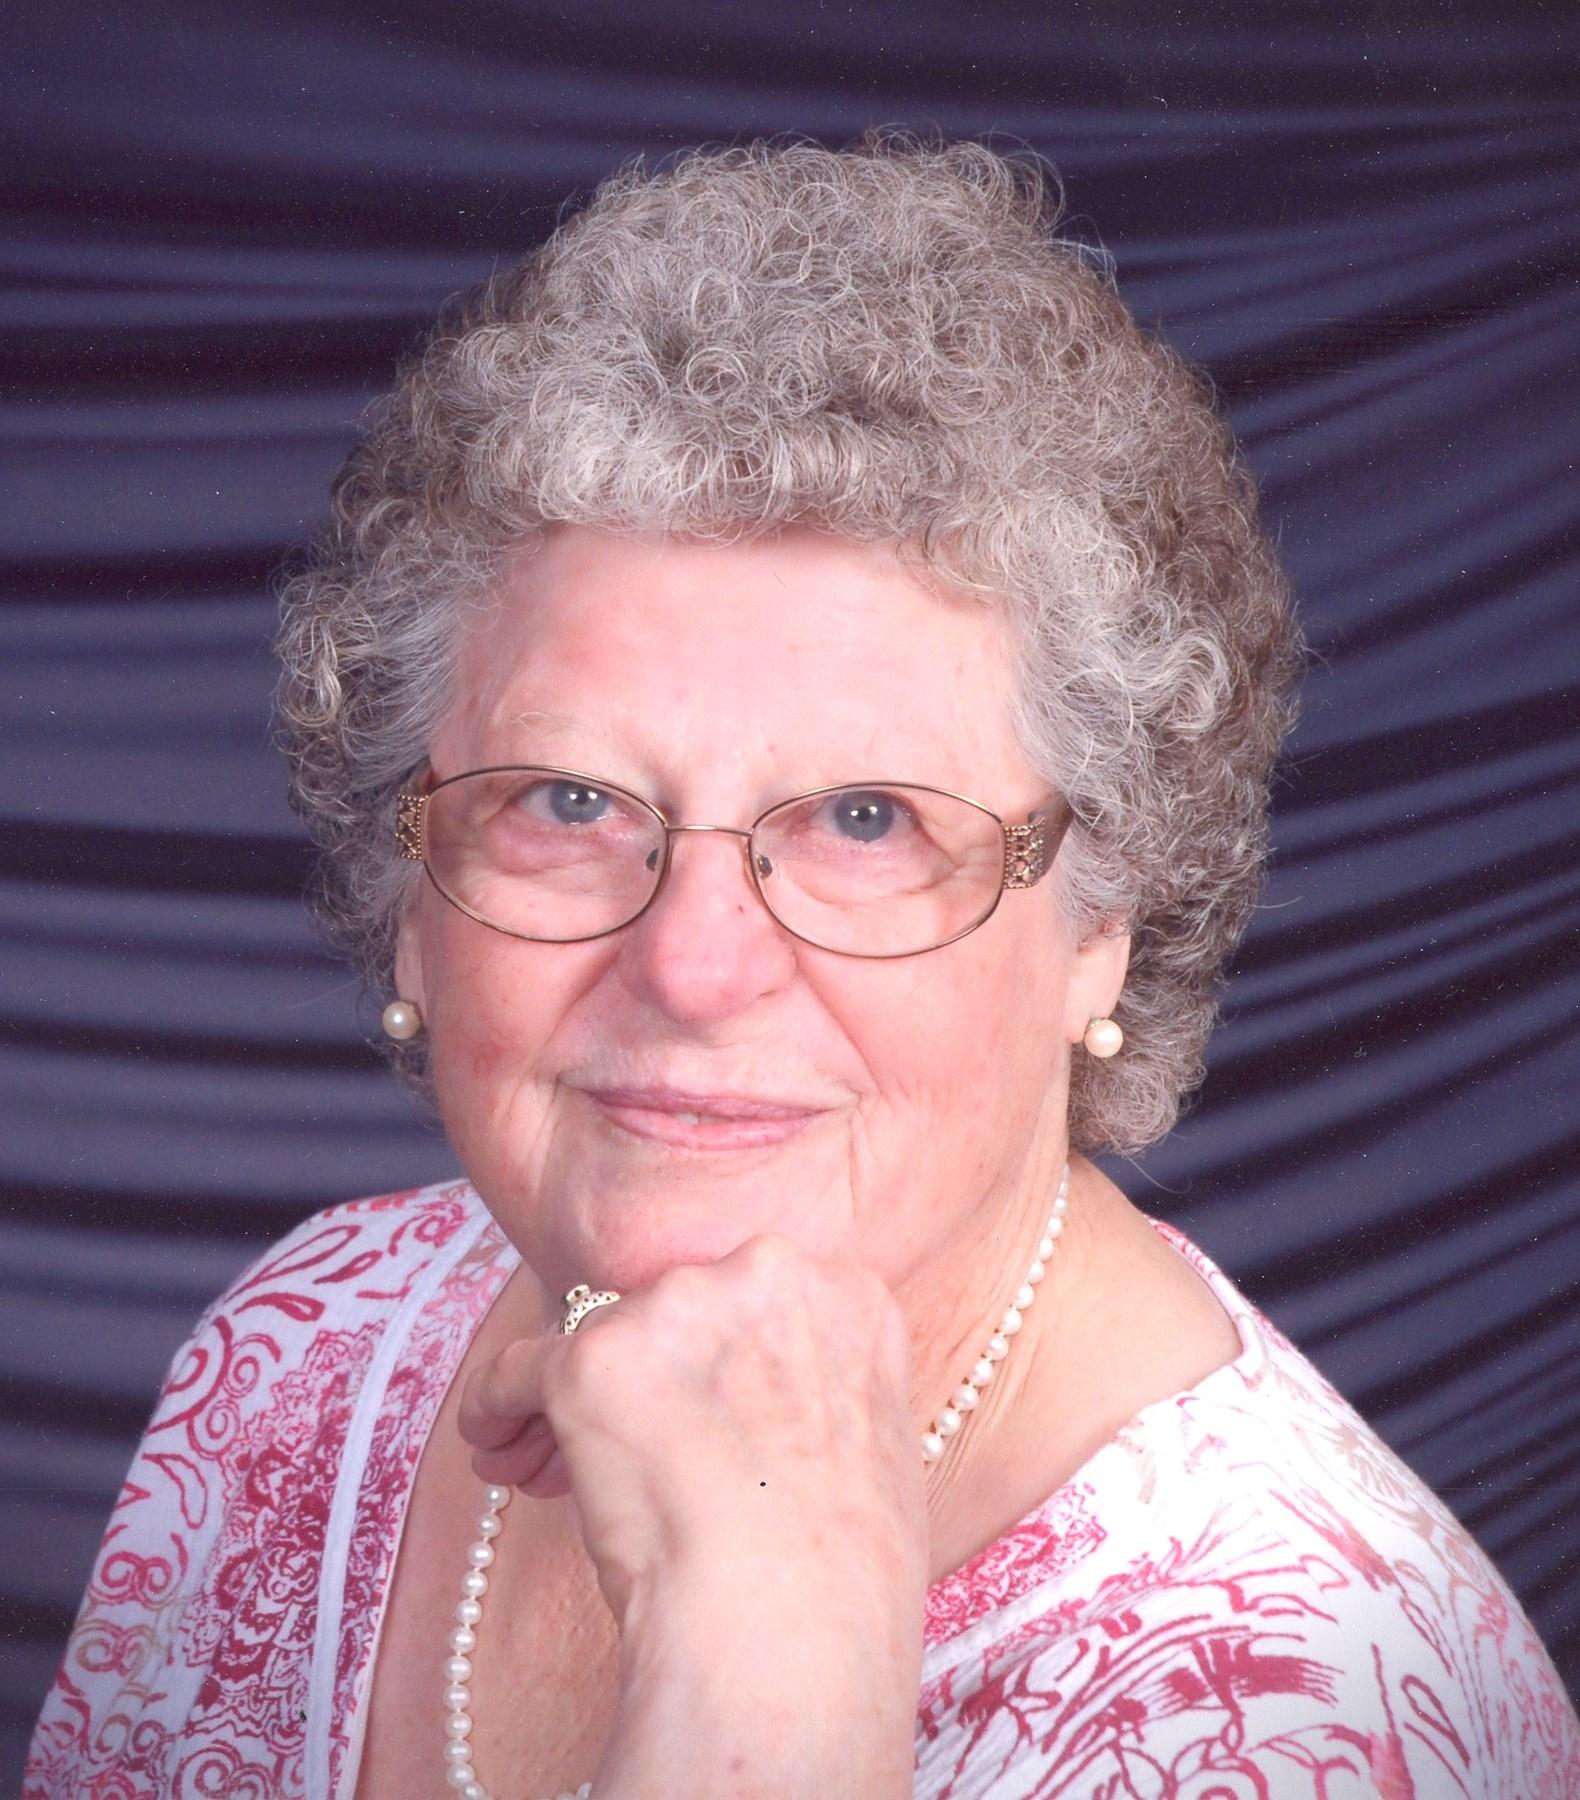 Tatiana Lysenko 3 Olympic medals in gymnastics,Glyn Houston (born 1926) Hot image Jessica Dunphy,Sun Feifei